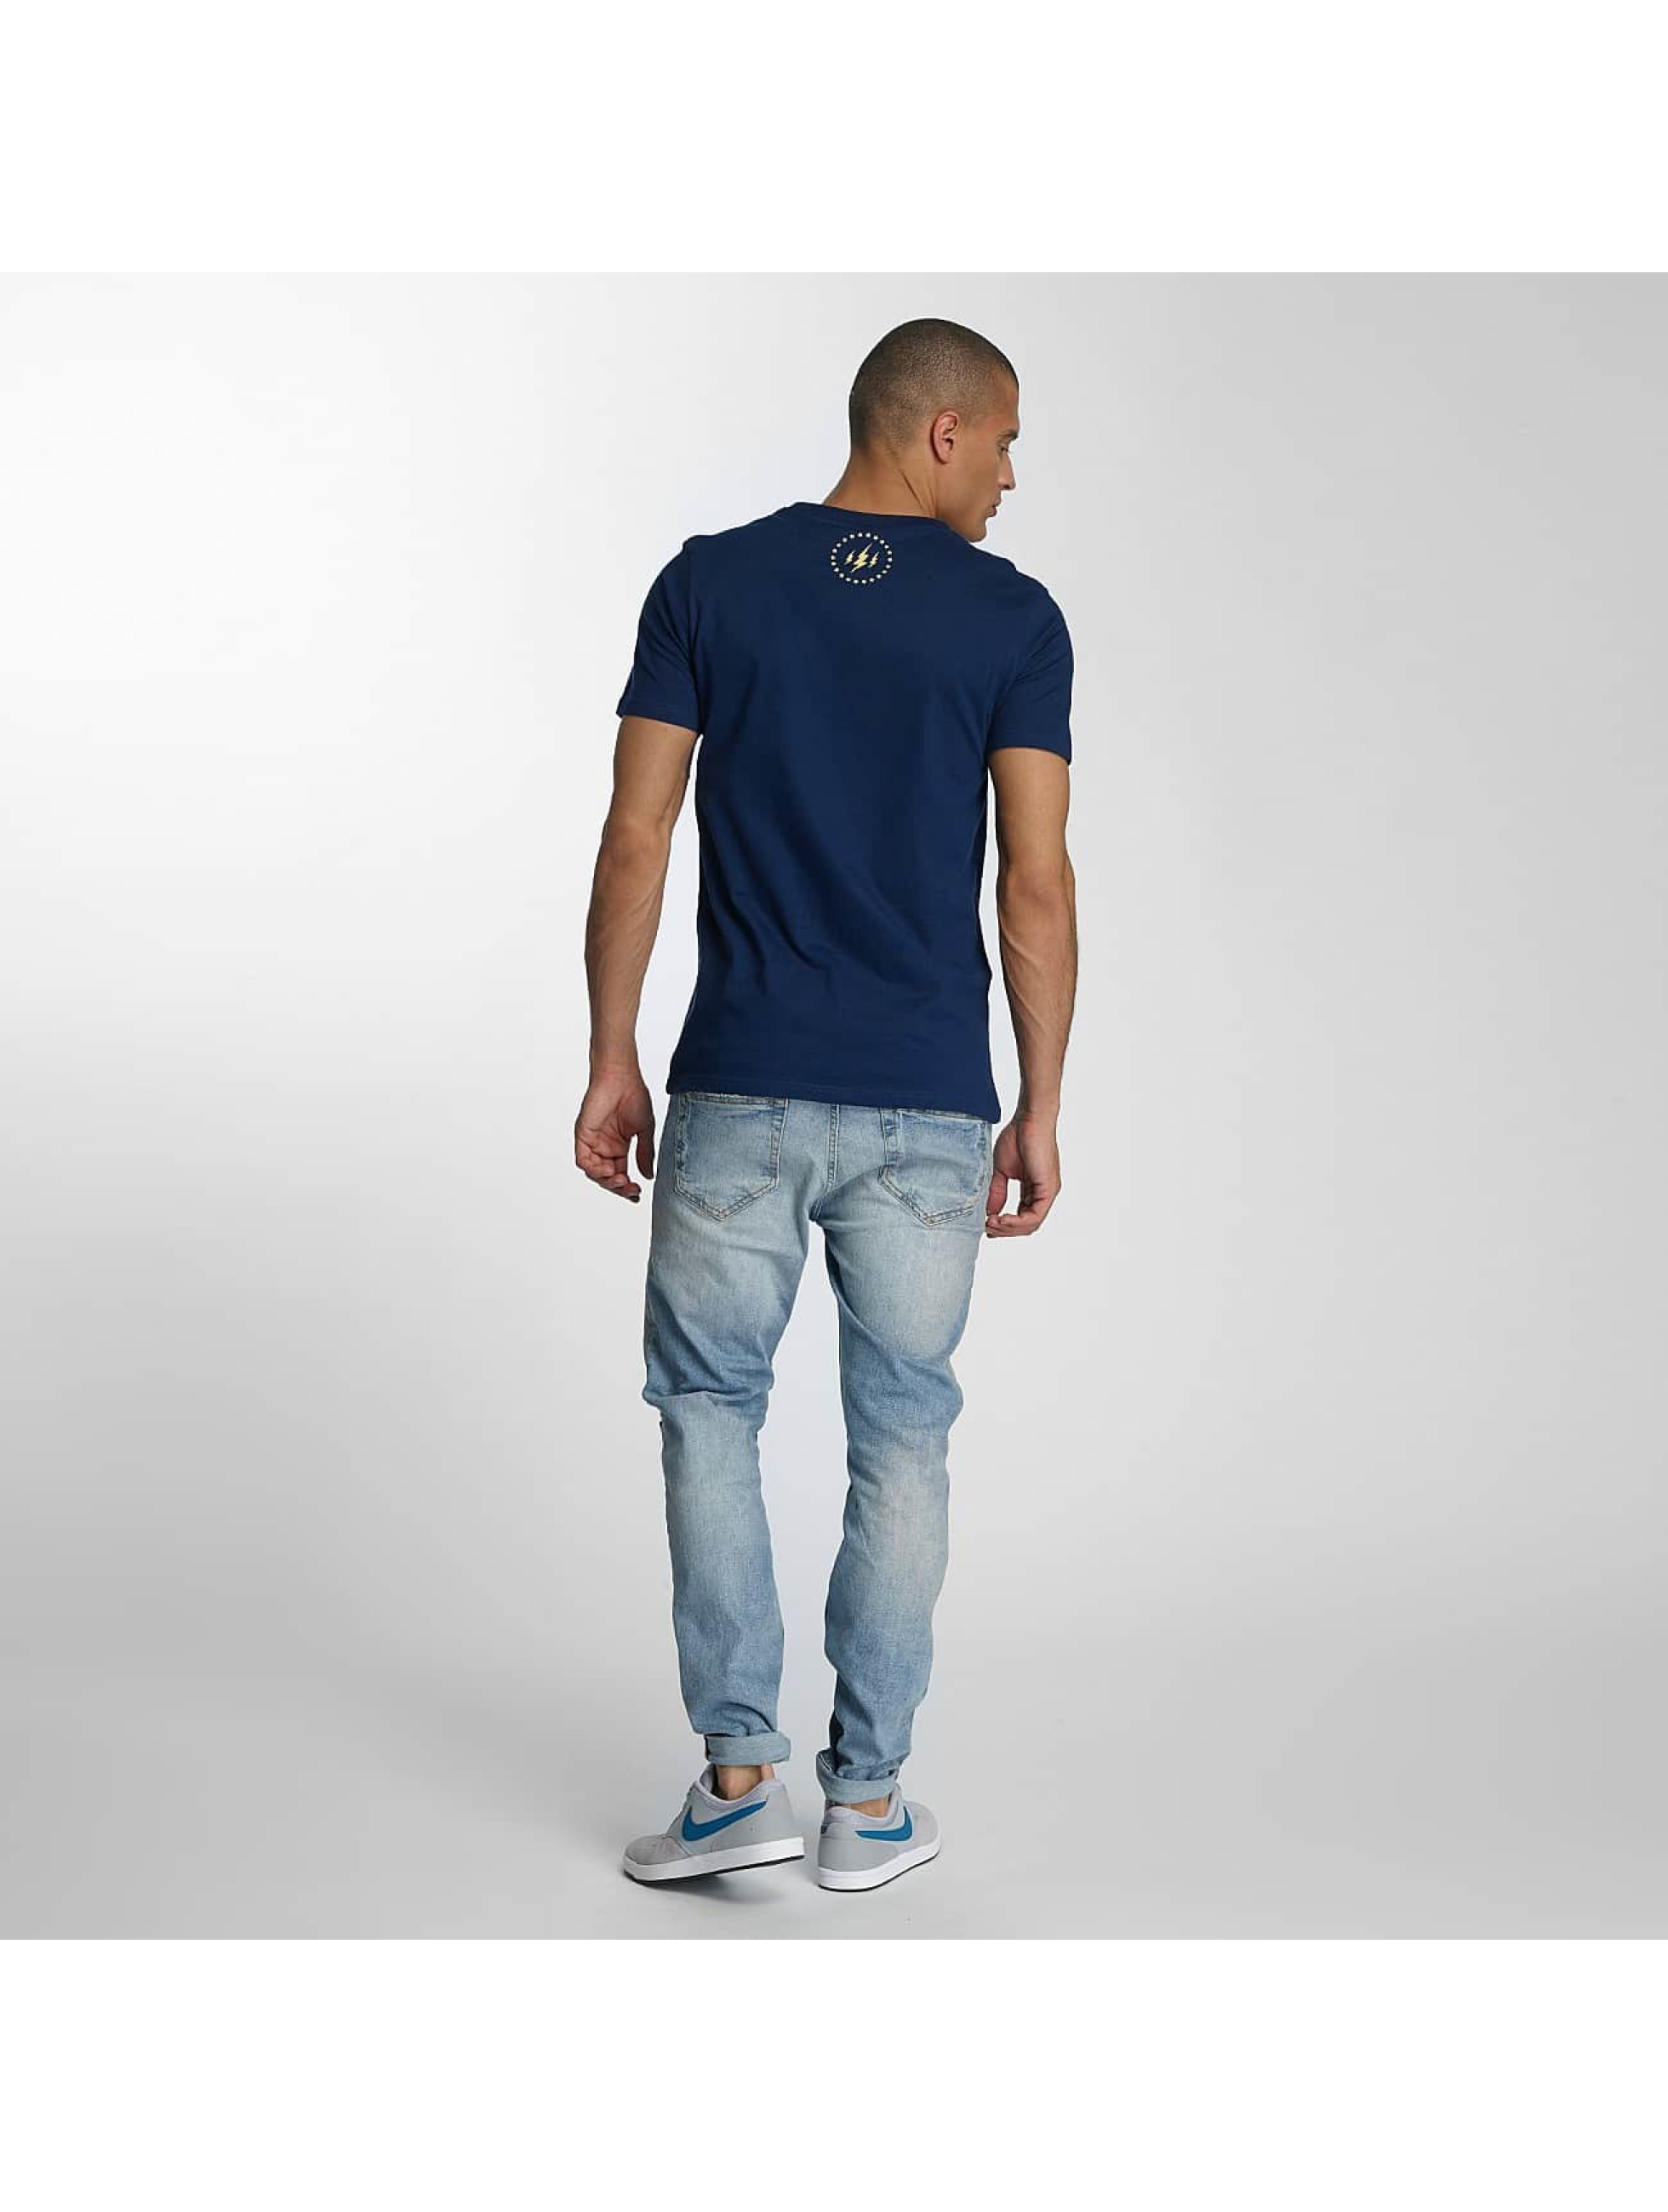 TrueSpin Camiseta 8 azul